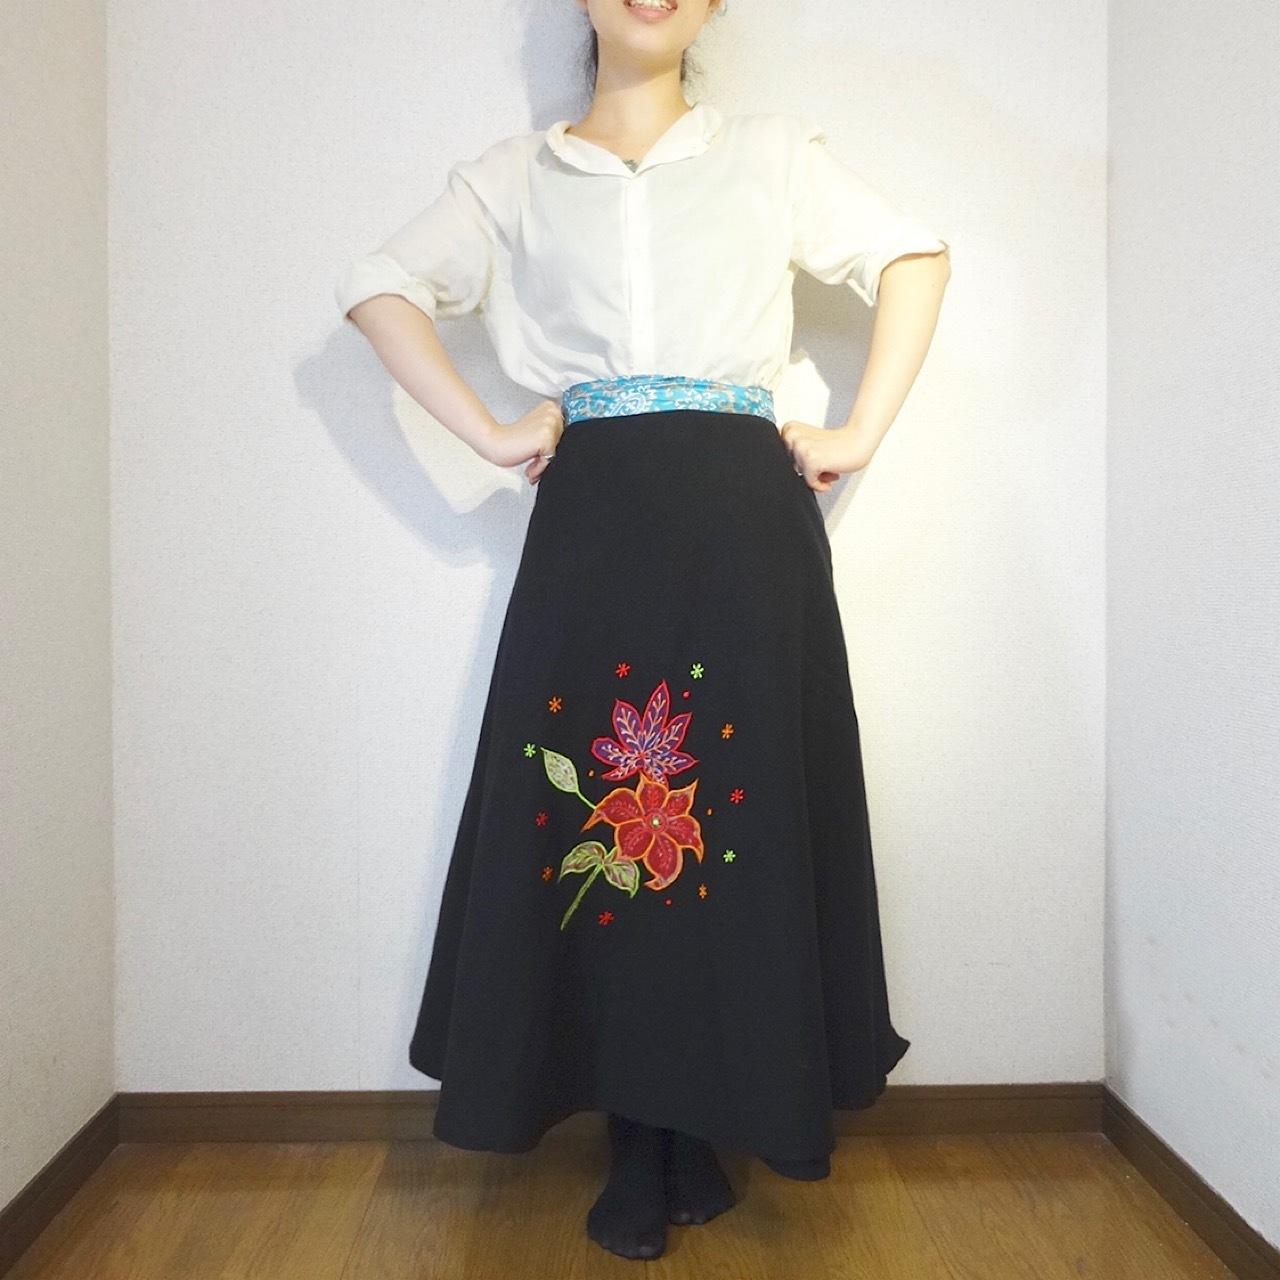 ebwb-004 刺繍コットン・サリー 巻きスカート